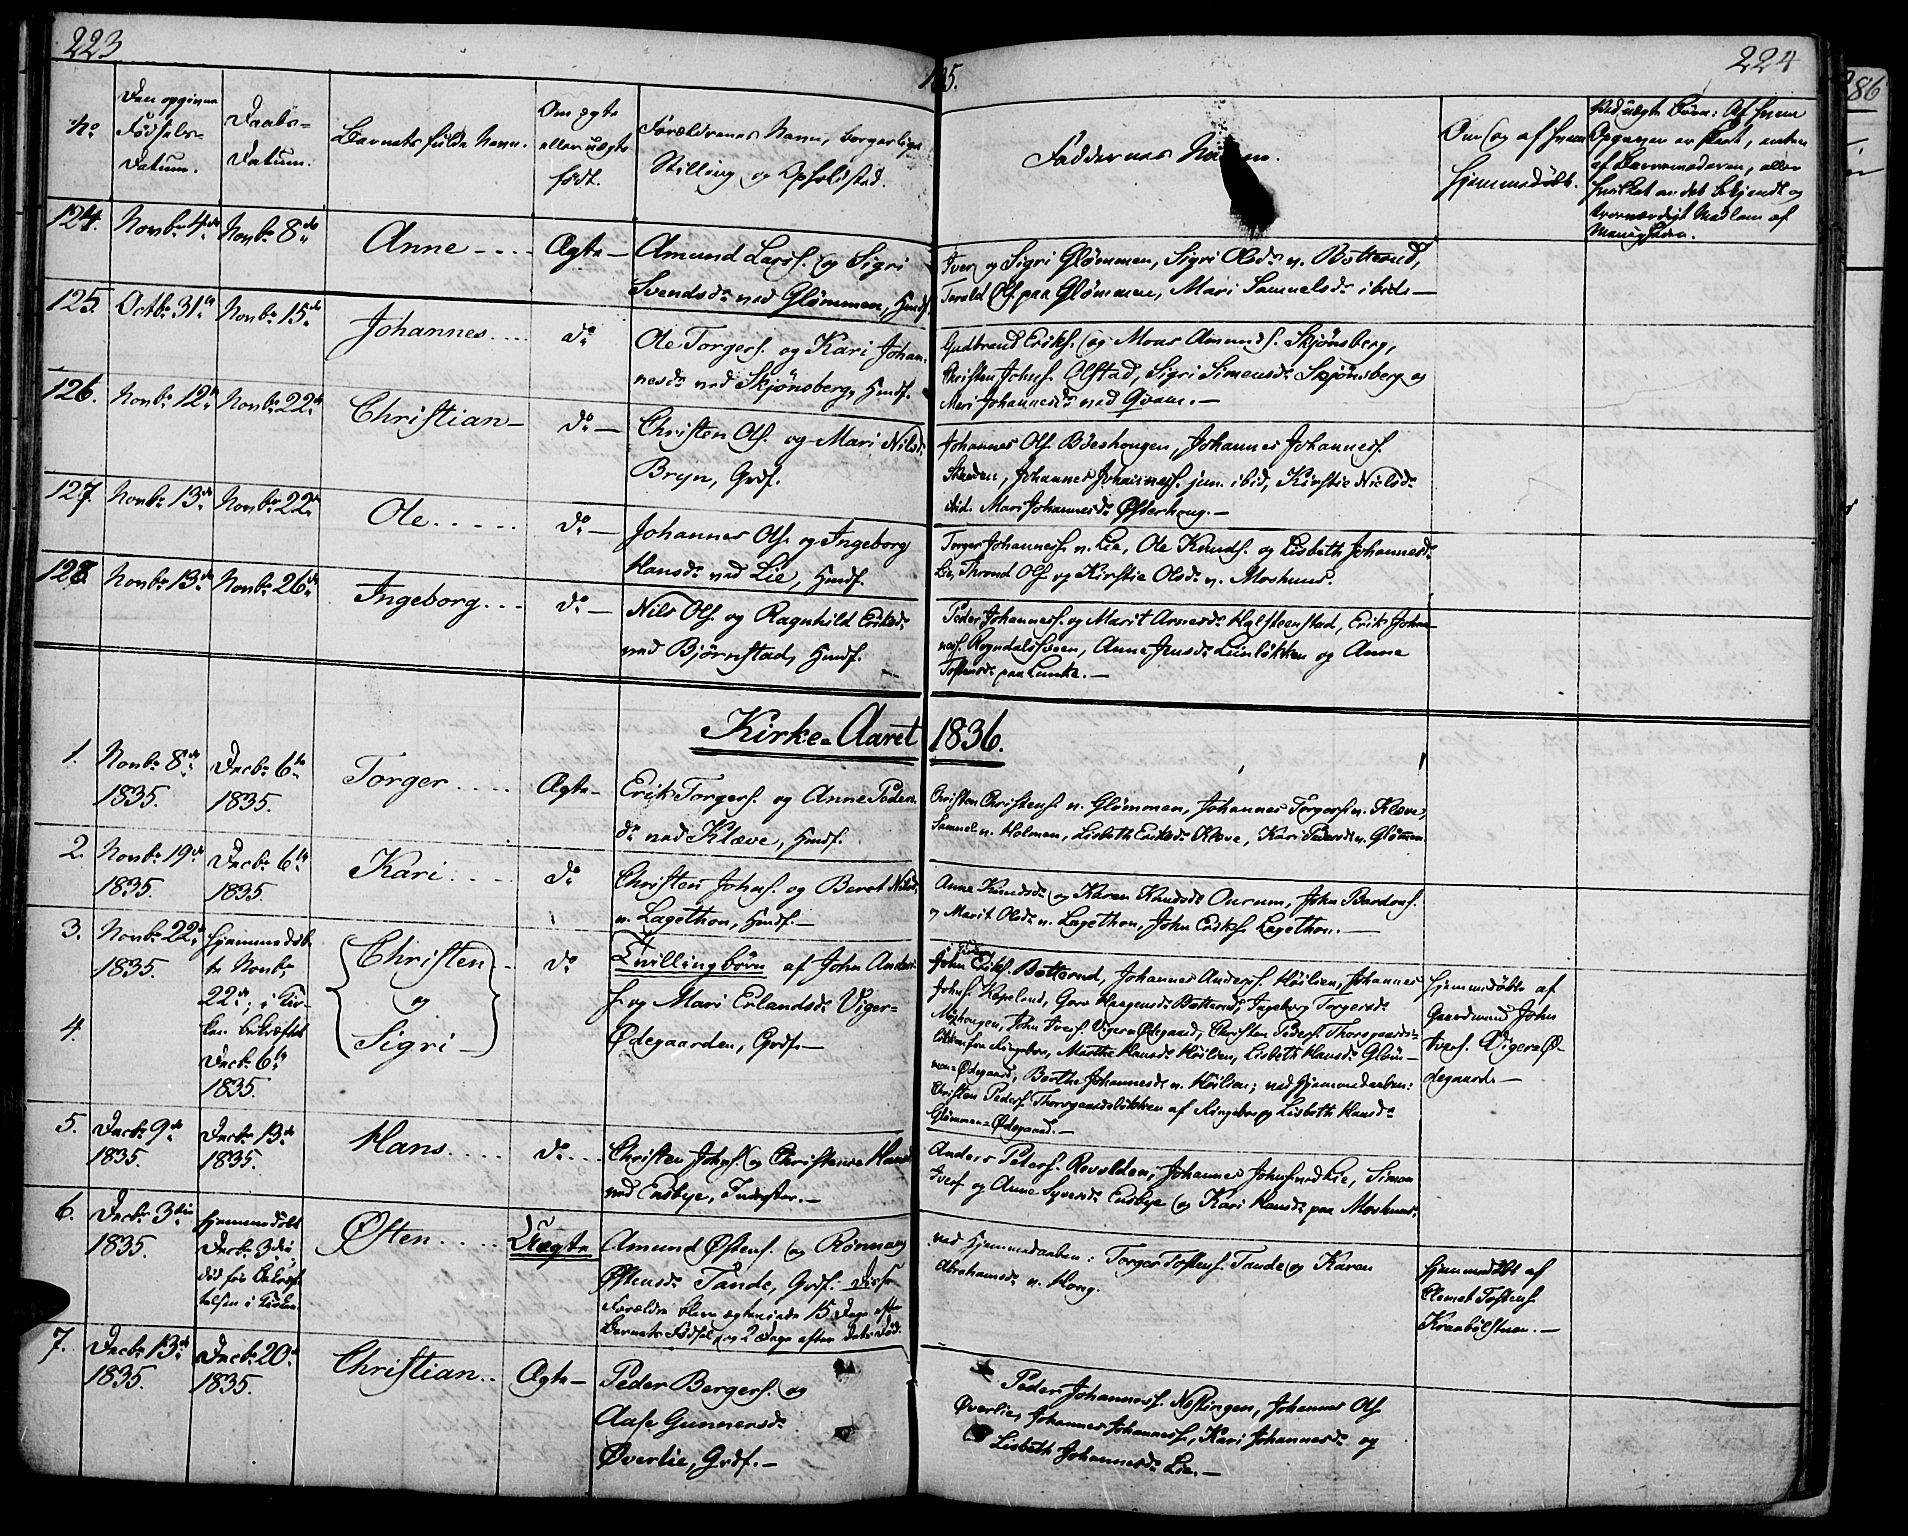 SAH, Øyer prestekontor, Ministerialbok nr. 4, 1824-1841, s. 223-224